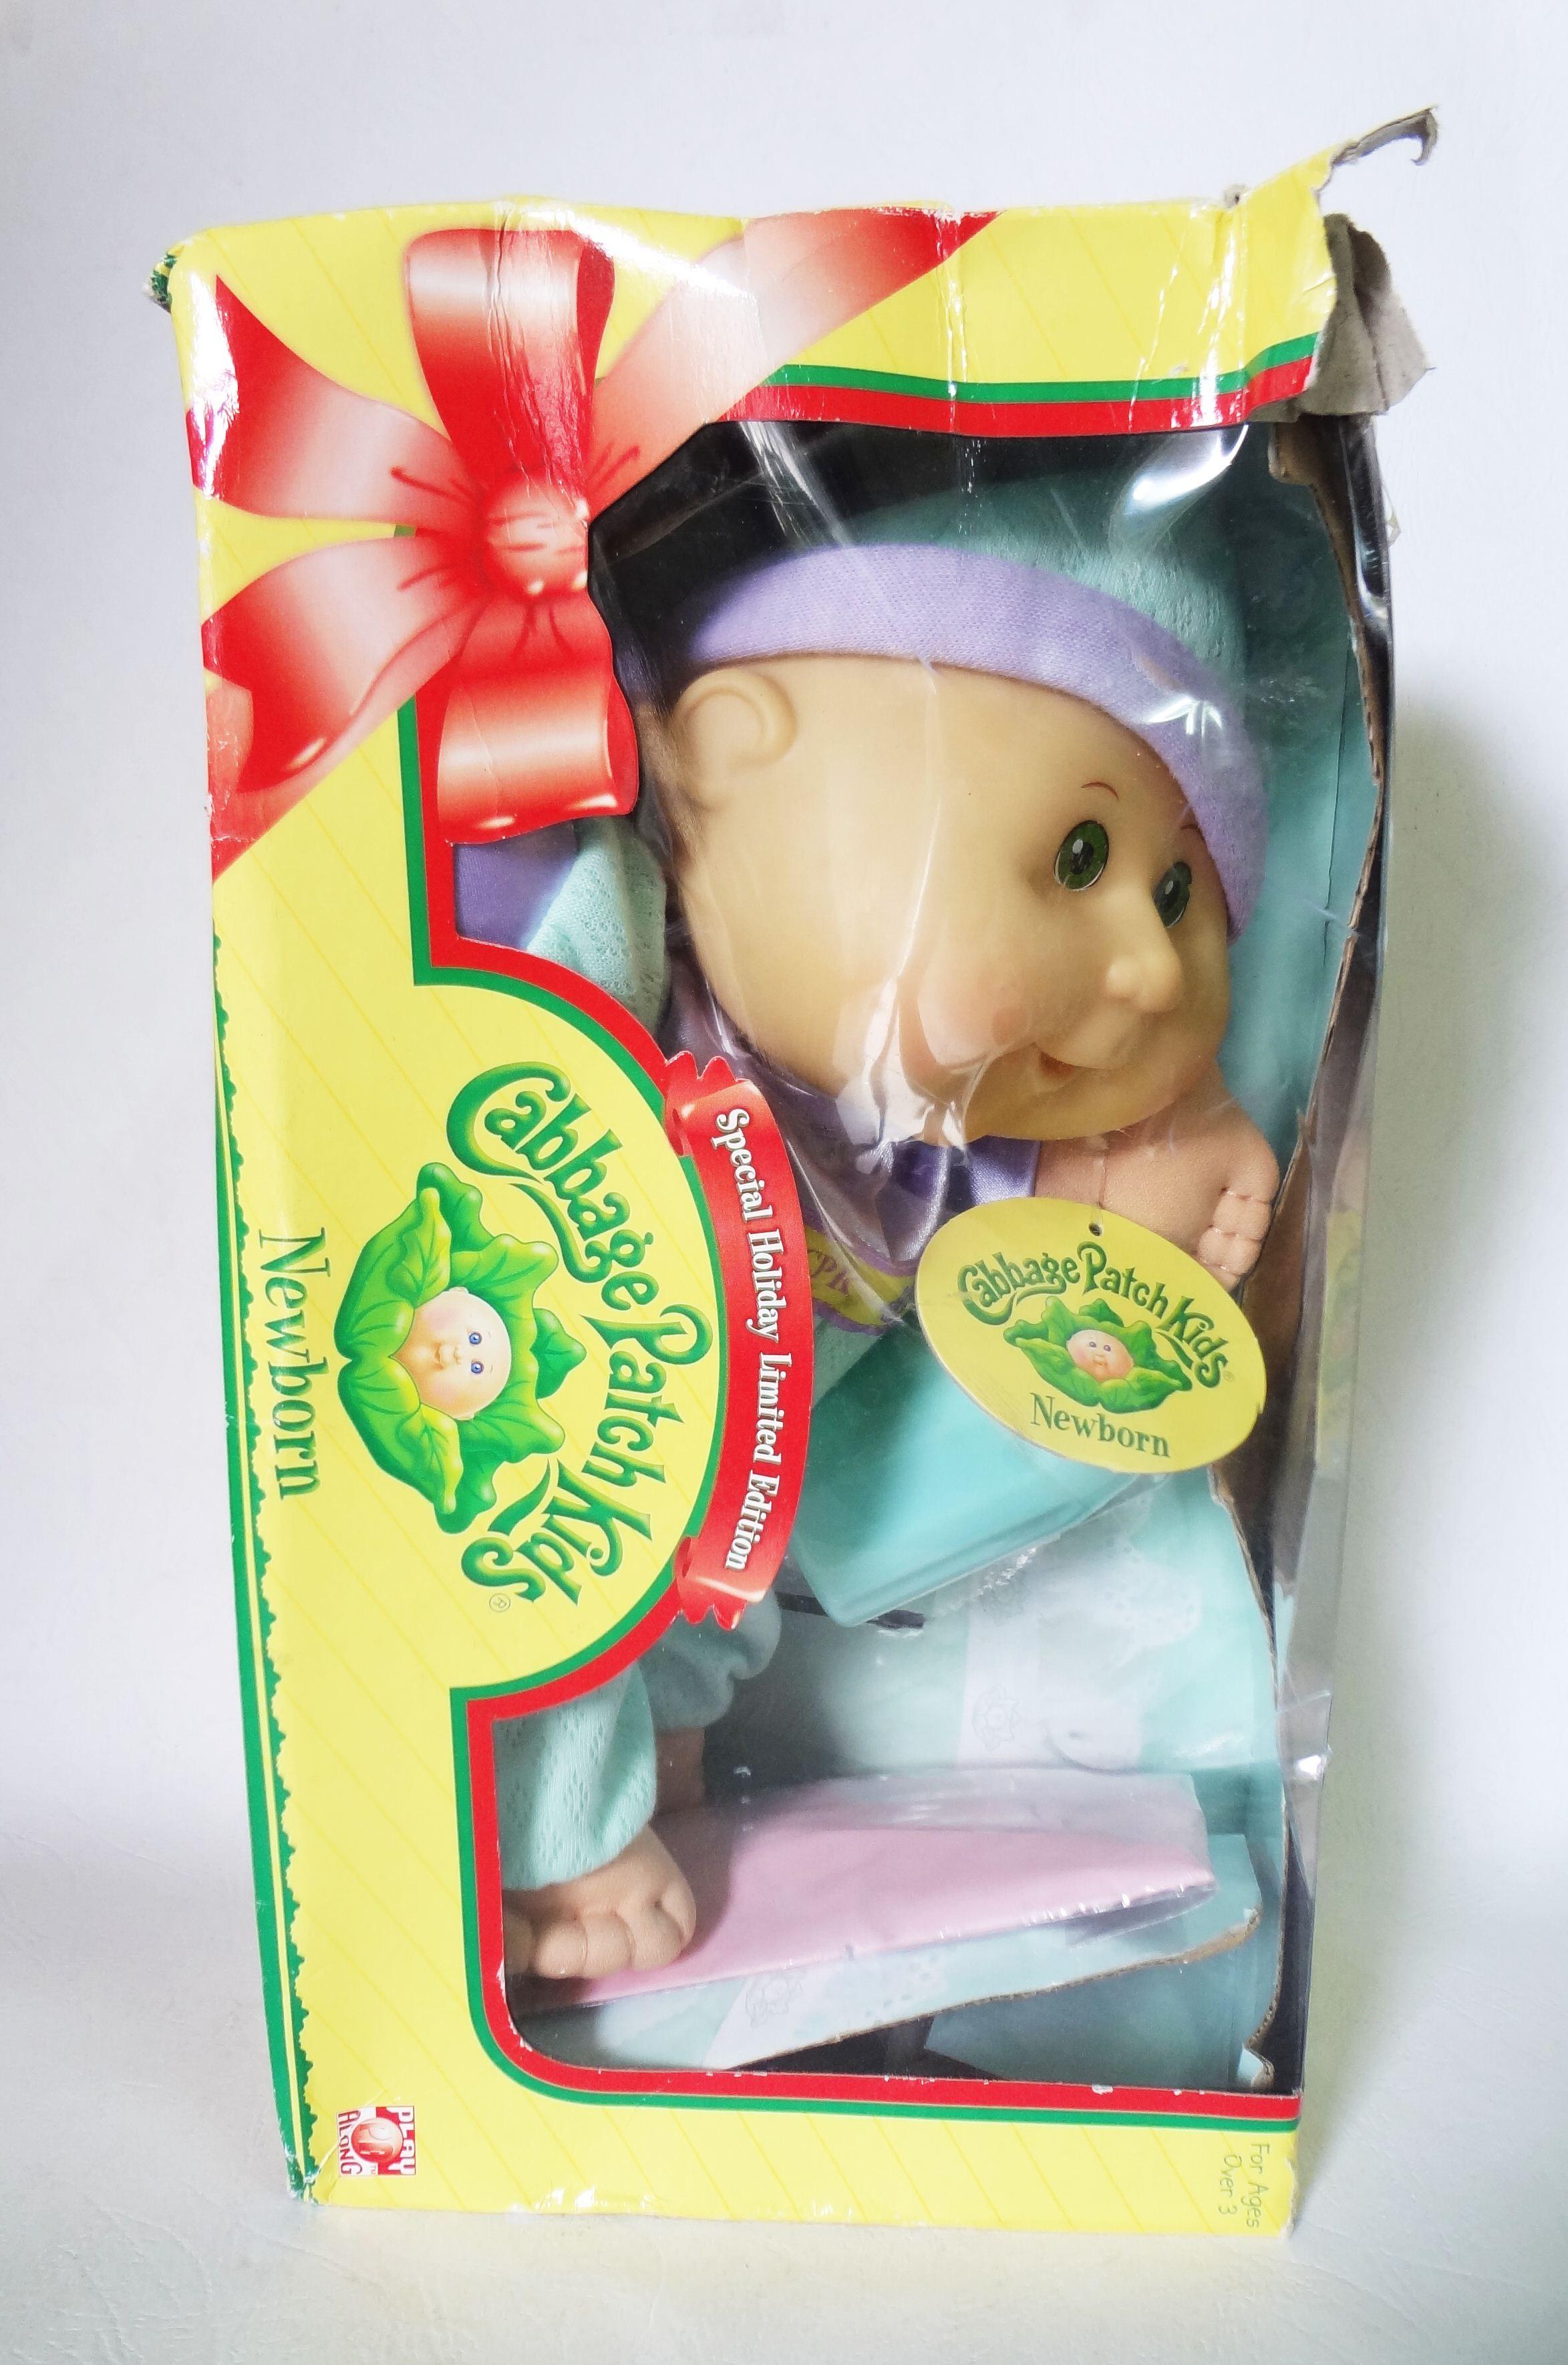 Cabbage Patch Kids, Newborn - Leilani Noemi